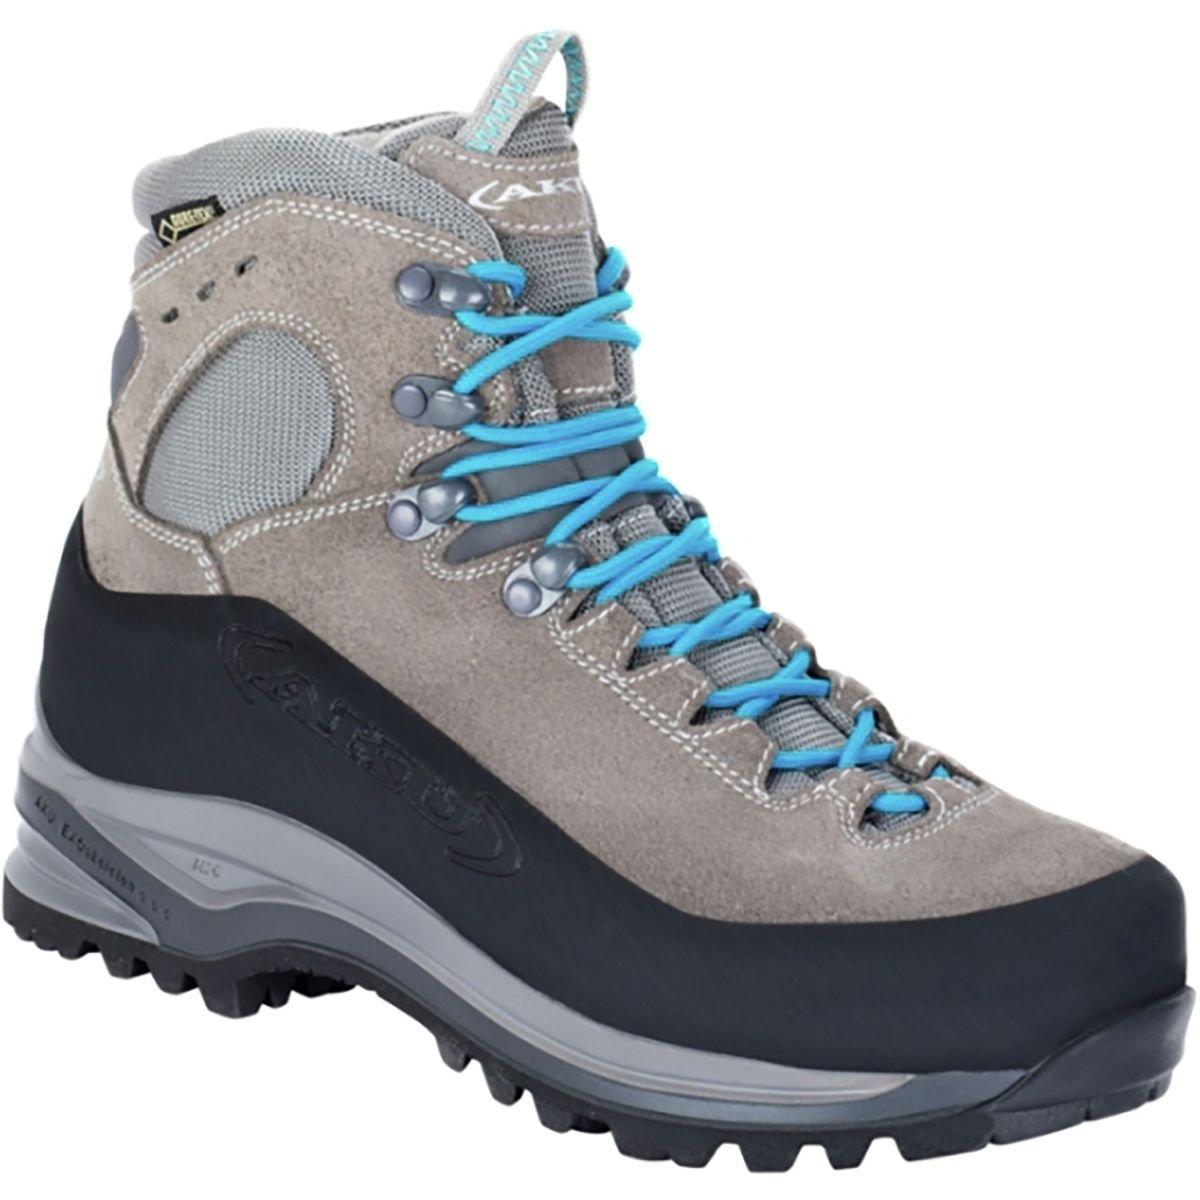 AKU Superalp GTX Backpacking Boot - Women's Light Grey/Turquoise, 9.0